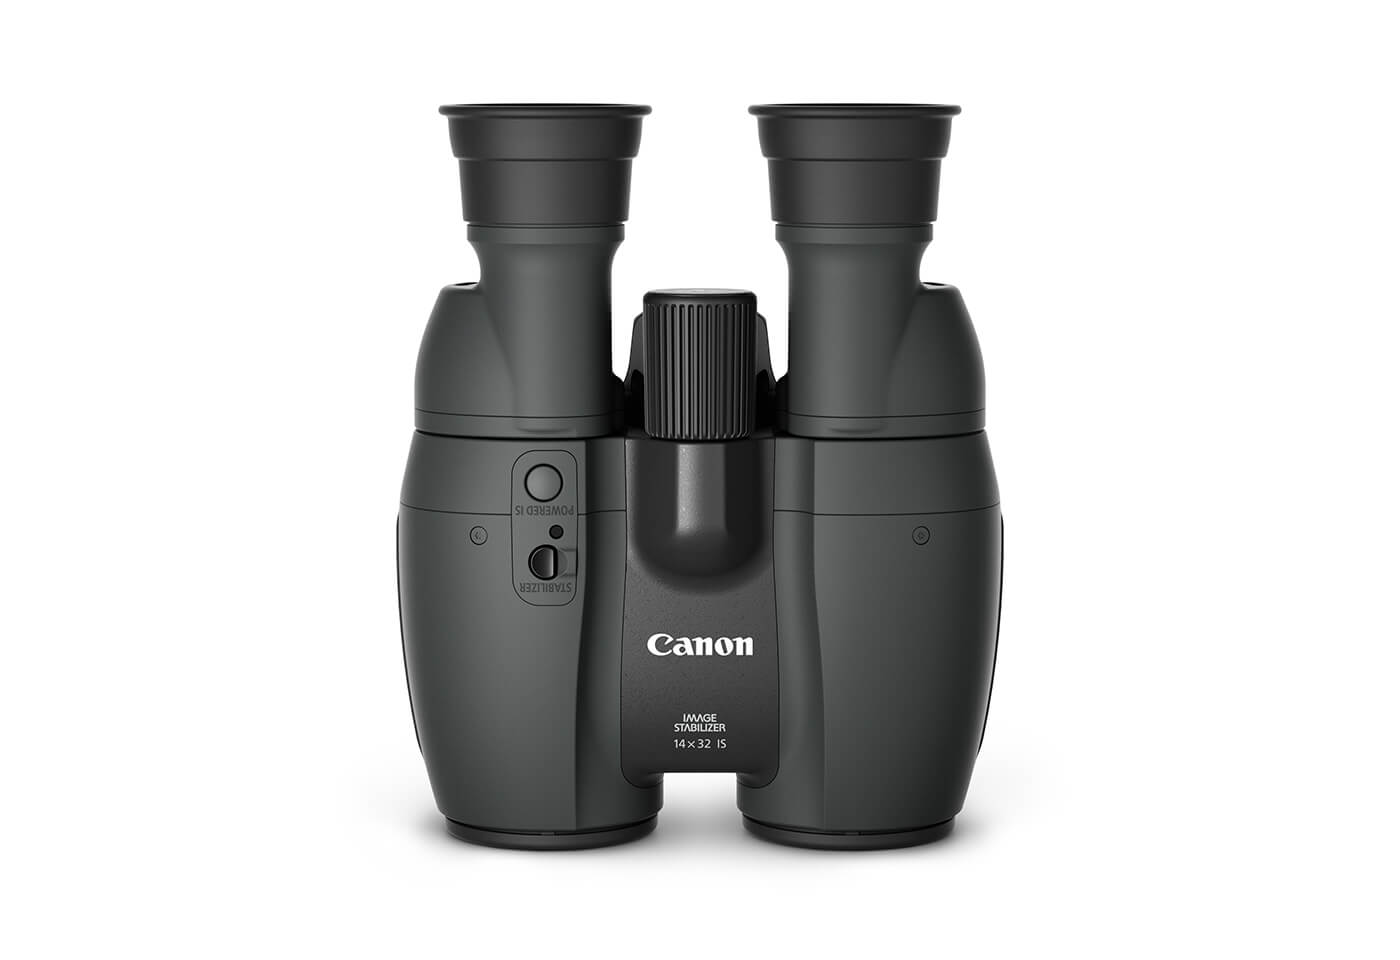 Canon 14x32 binoculars front image